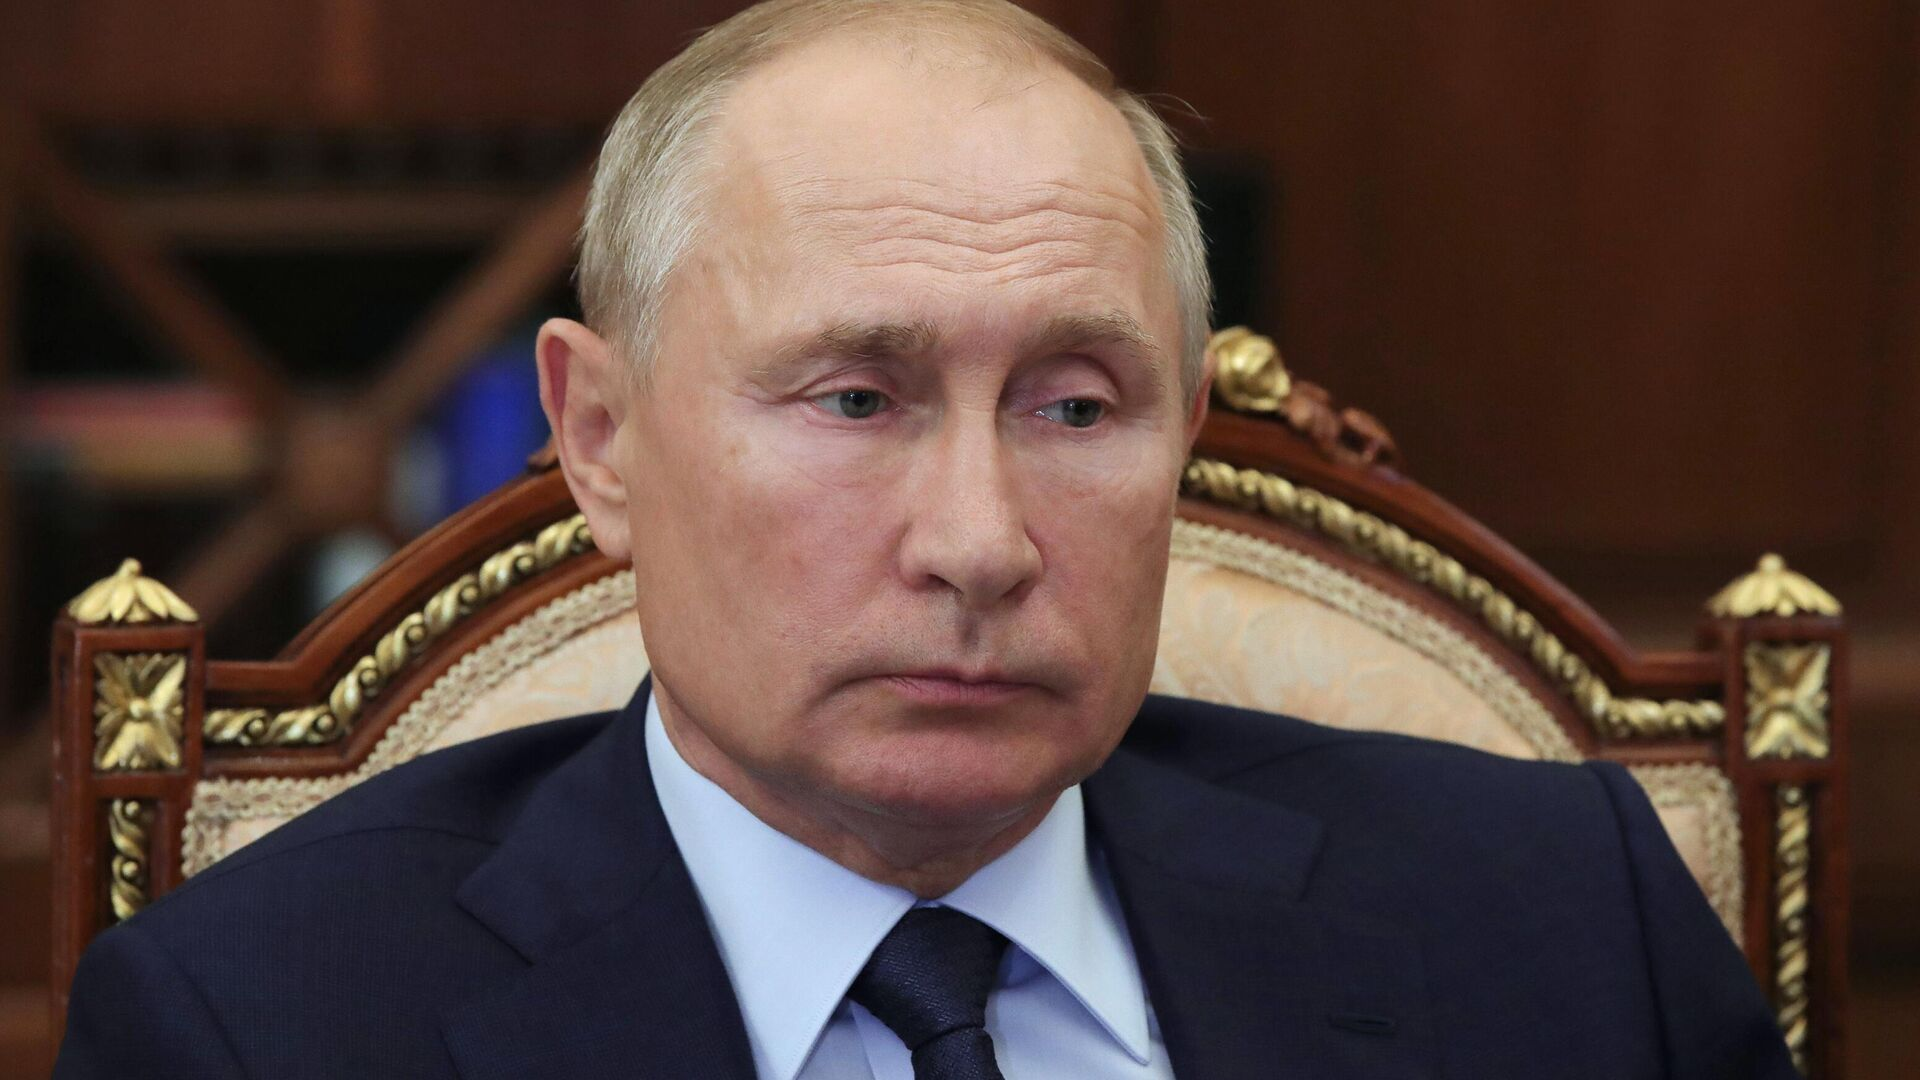 Президент РФ Владимир Путин  - РИА Новости, 1920, 23.09.2020